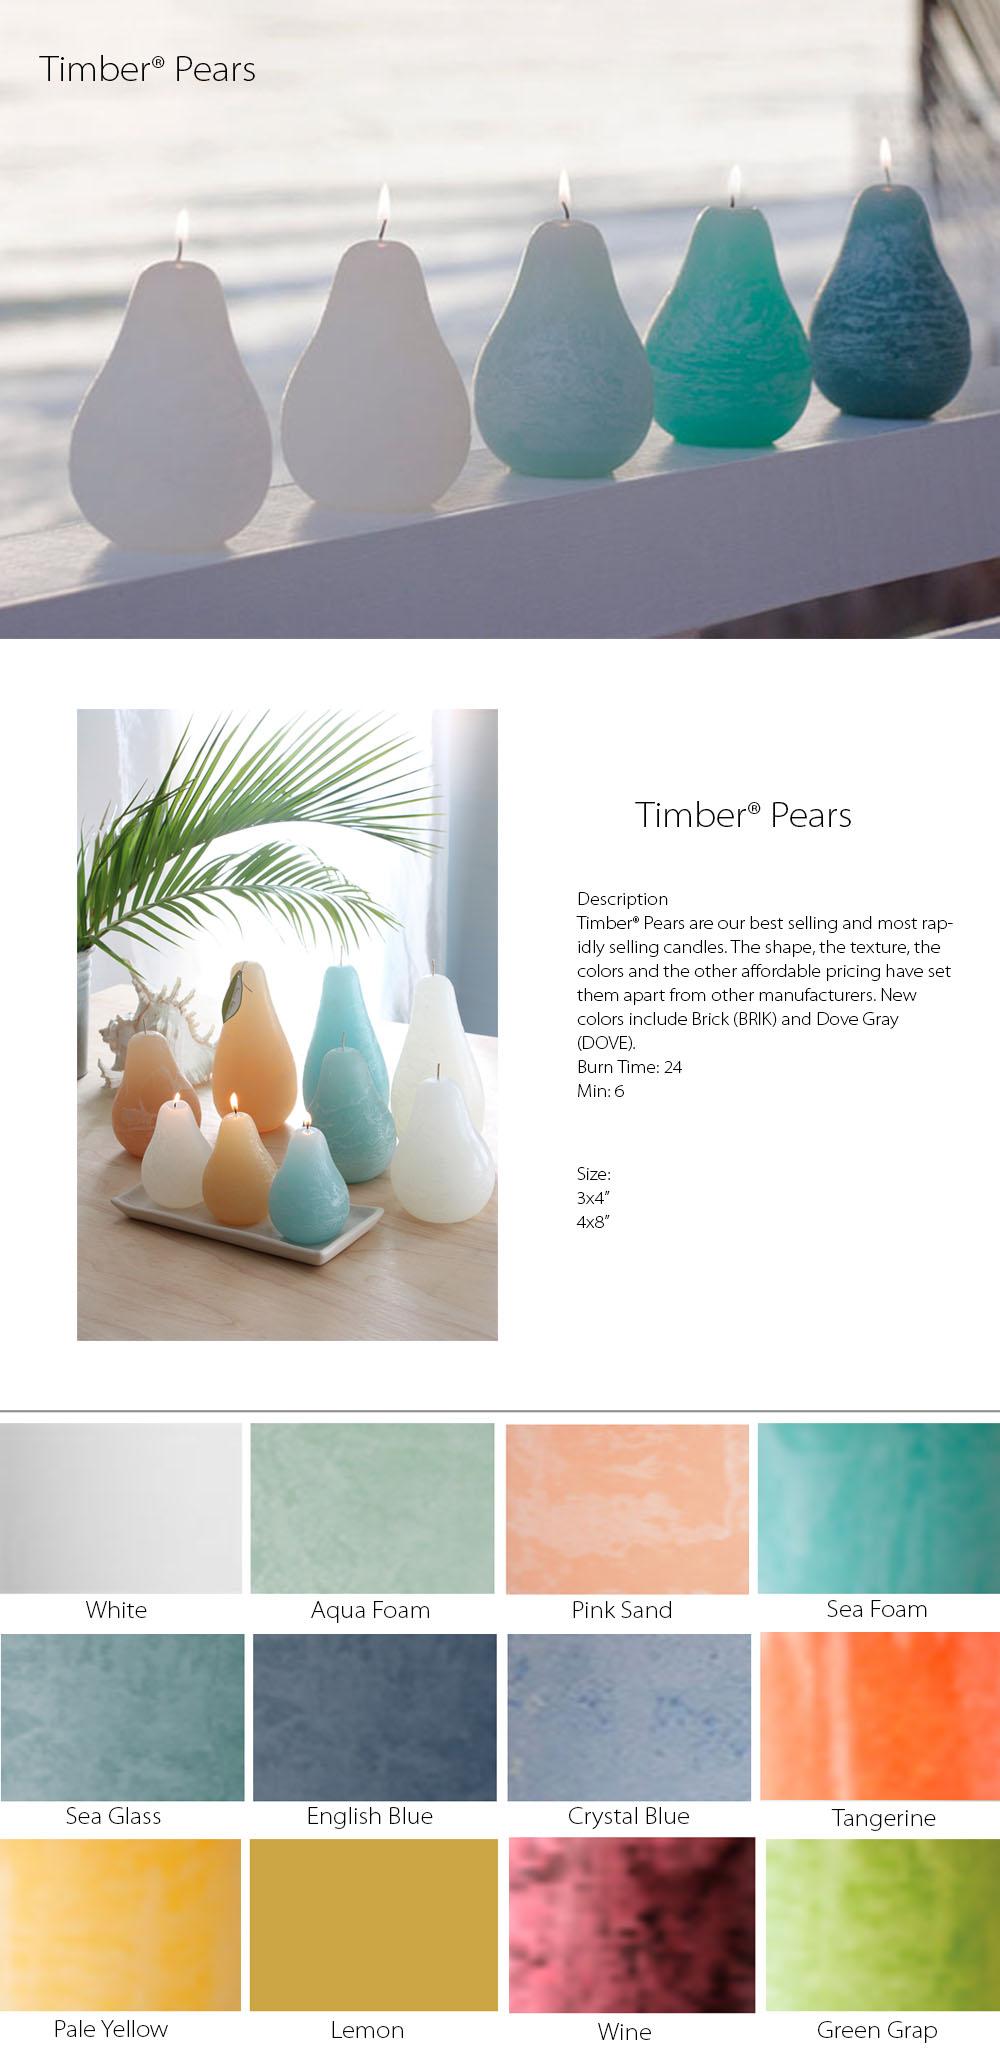 Timber® Pears From Vance Kitira